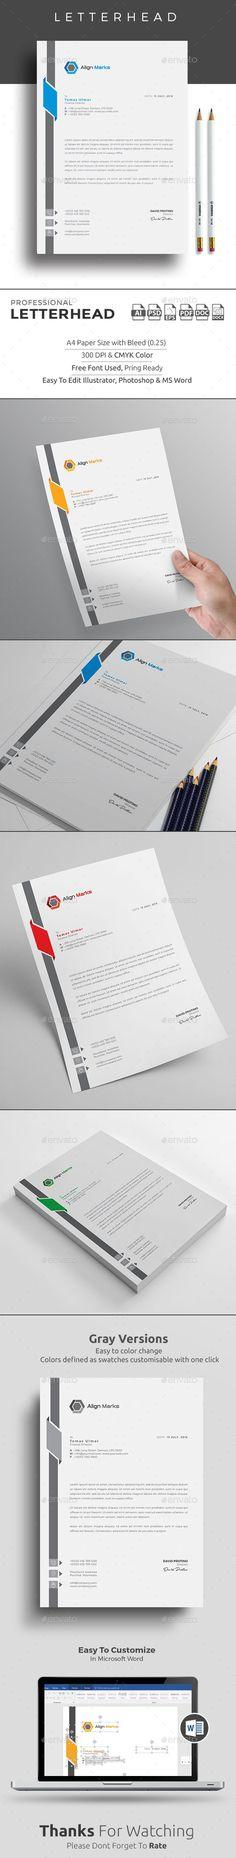 business letterhead template wordairplane letterhead